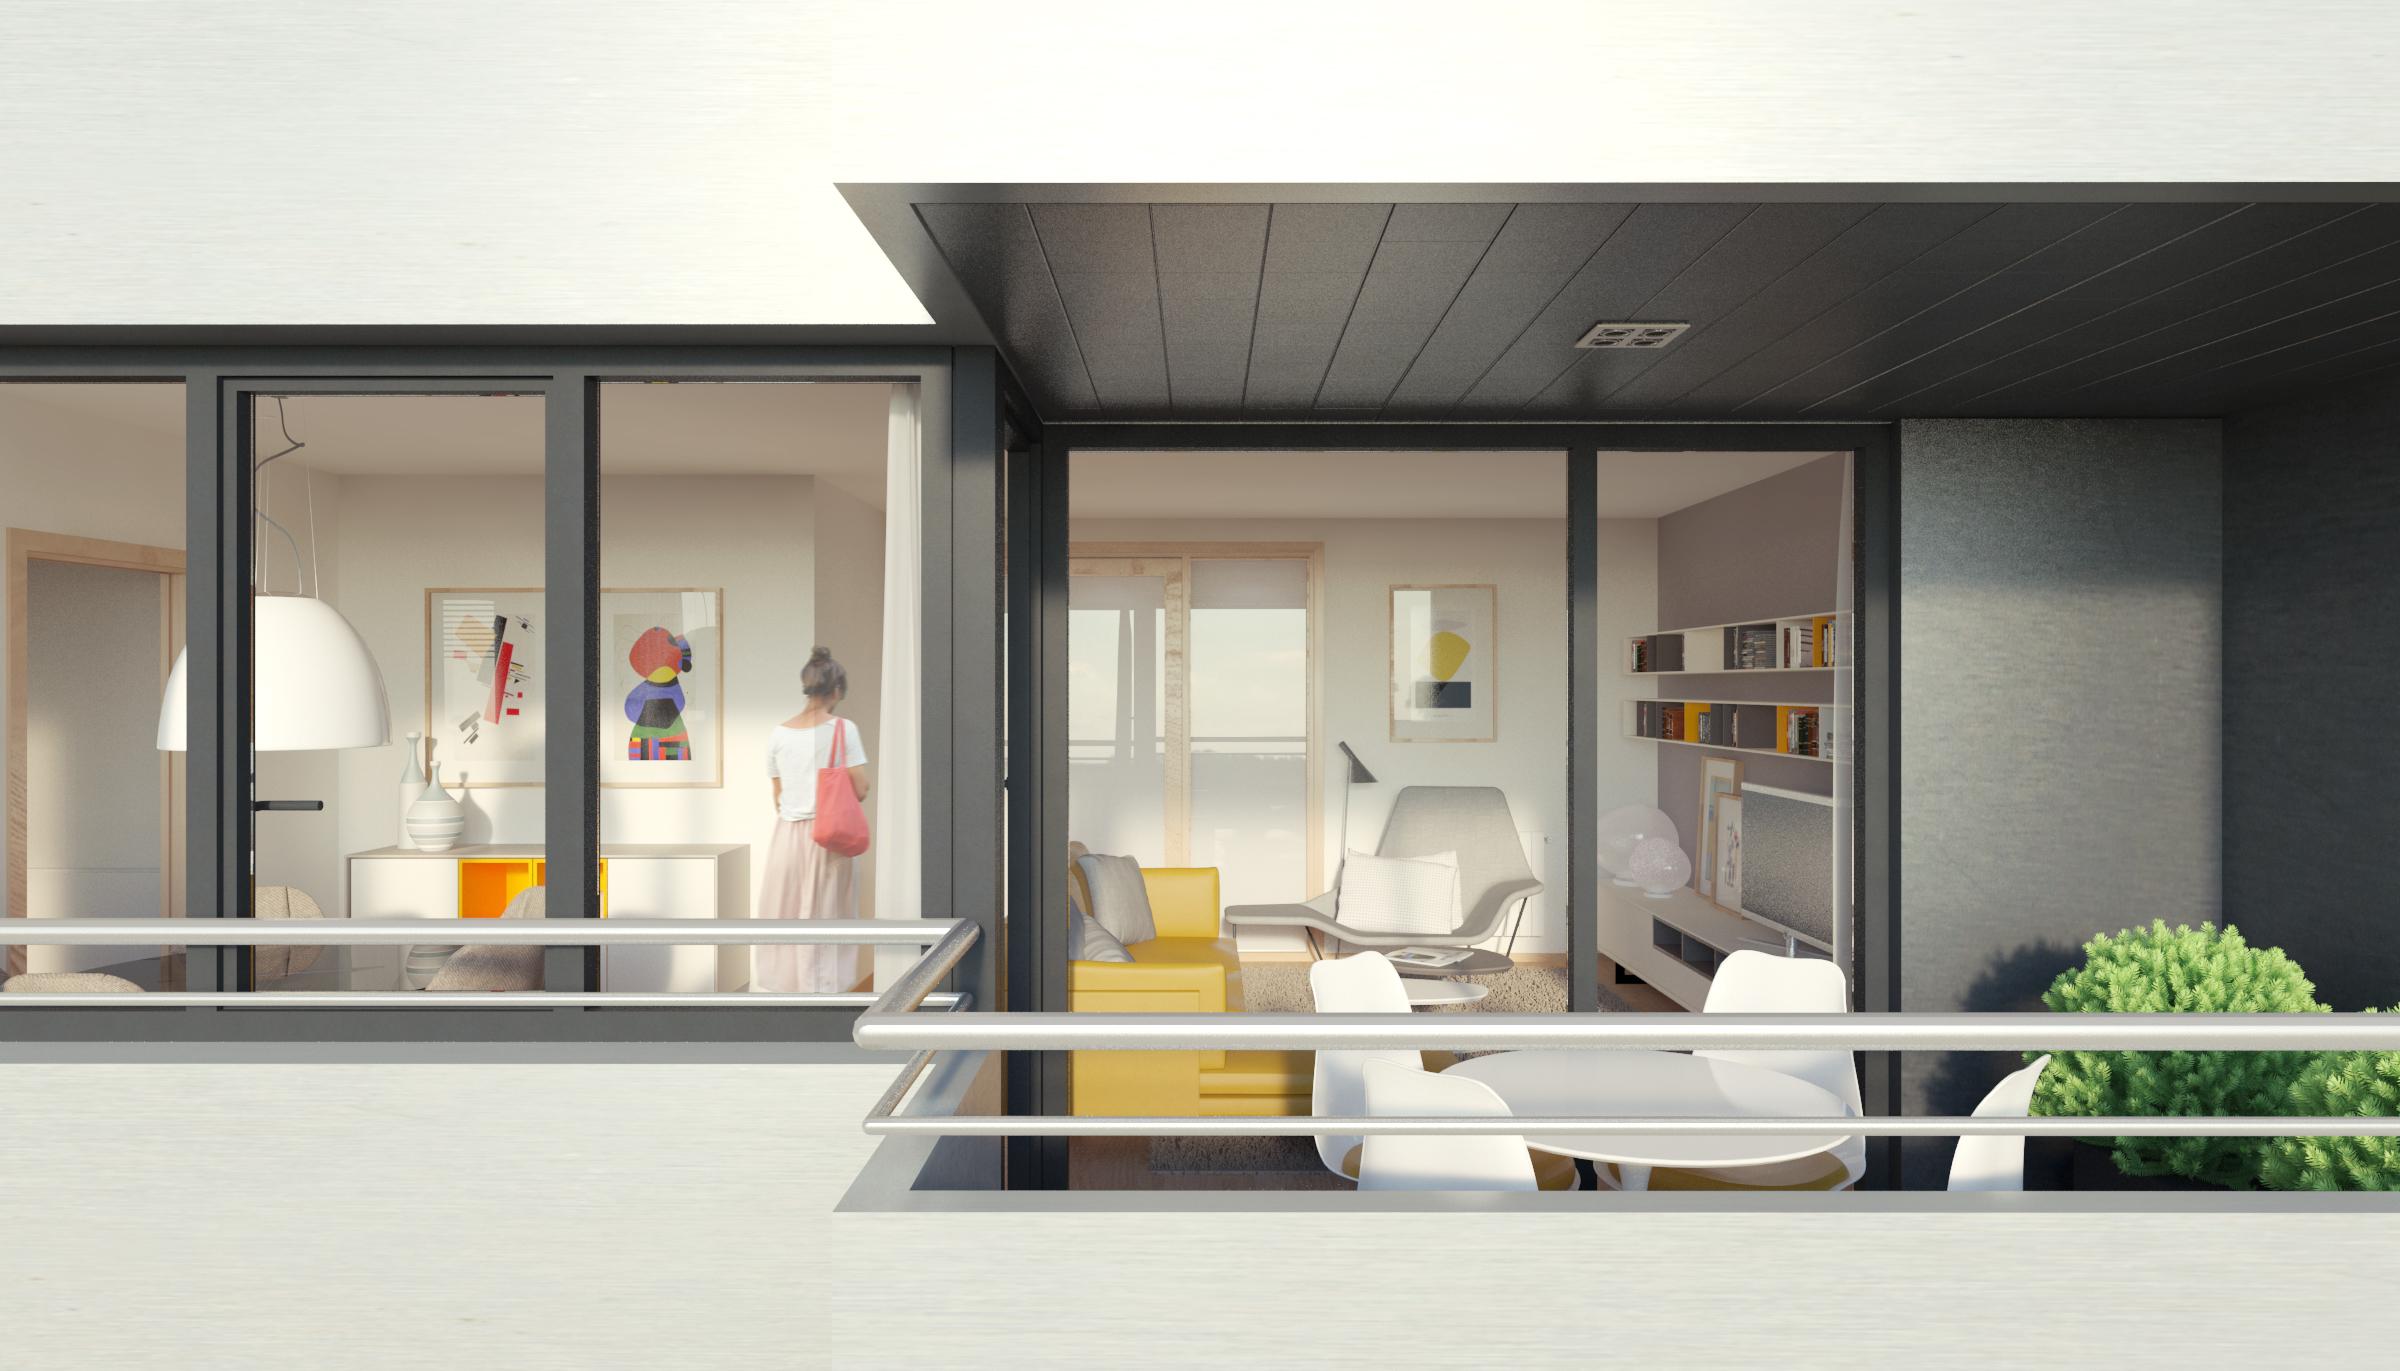 terraza 3 dormitorios